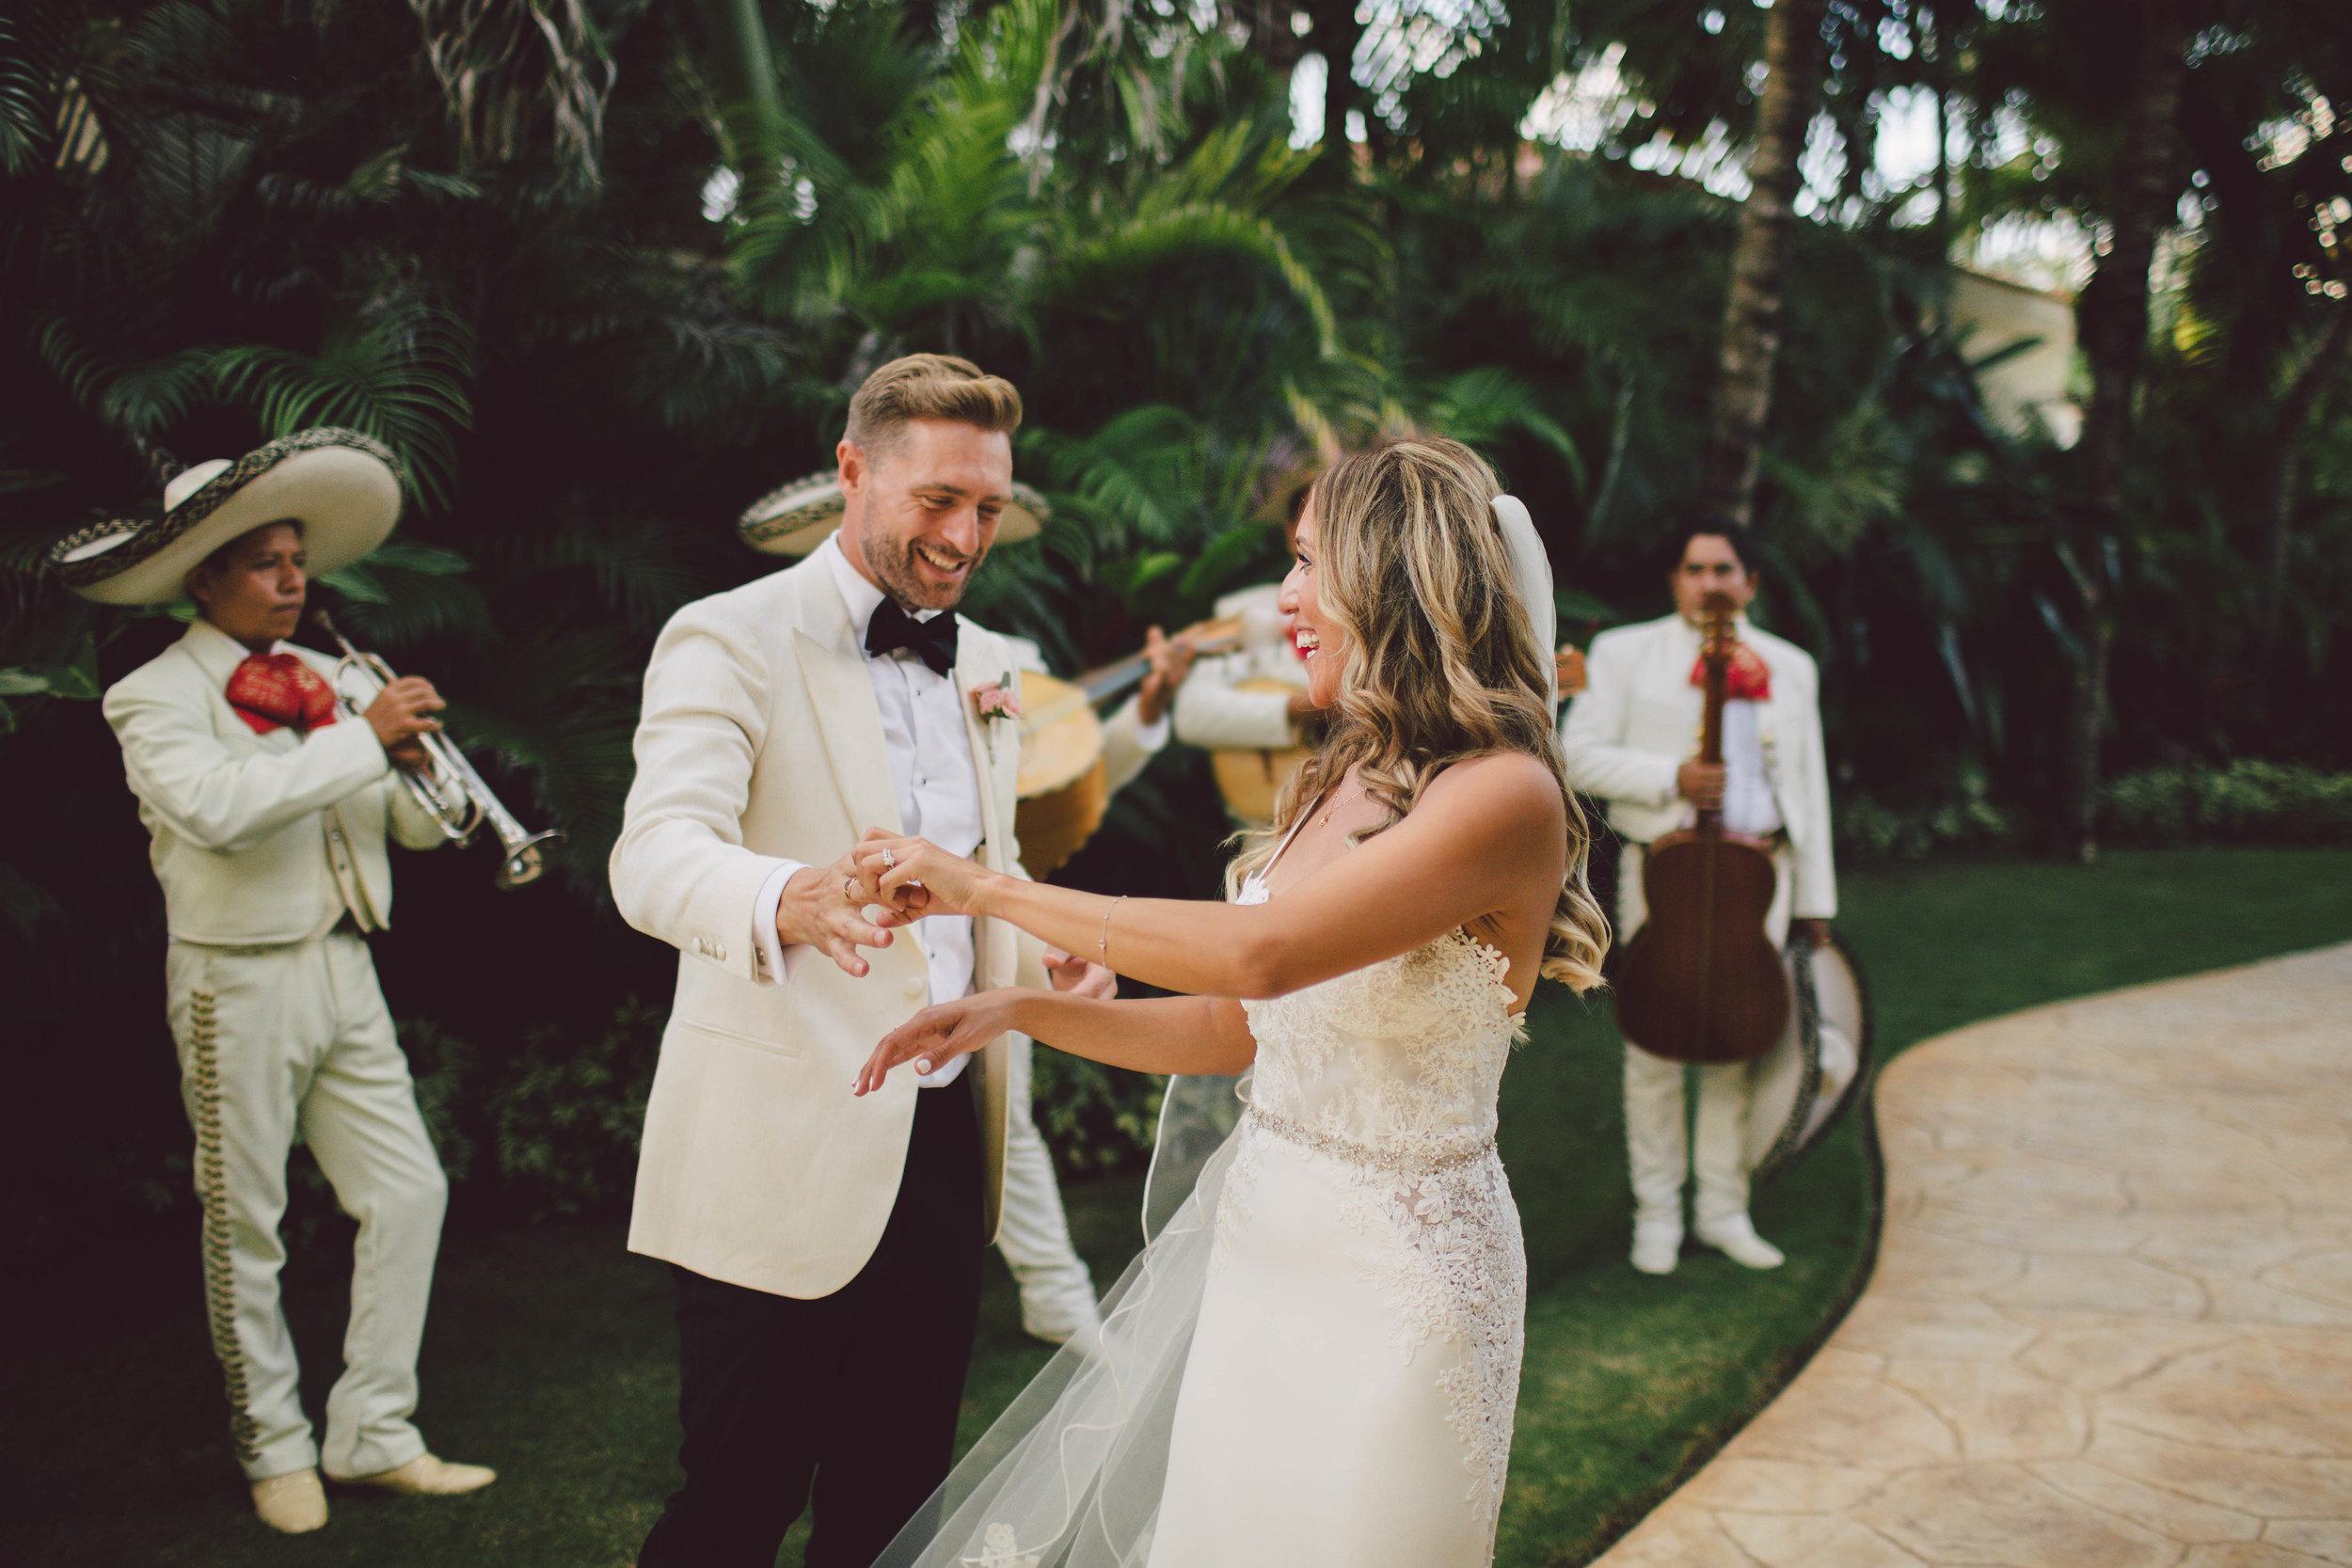 mexico_wedding_cancun_villa_la_joya_evangeline_lane_105.jpg